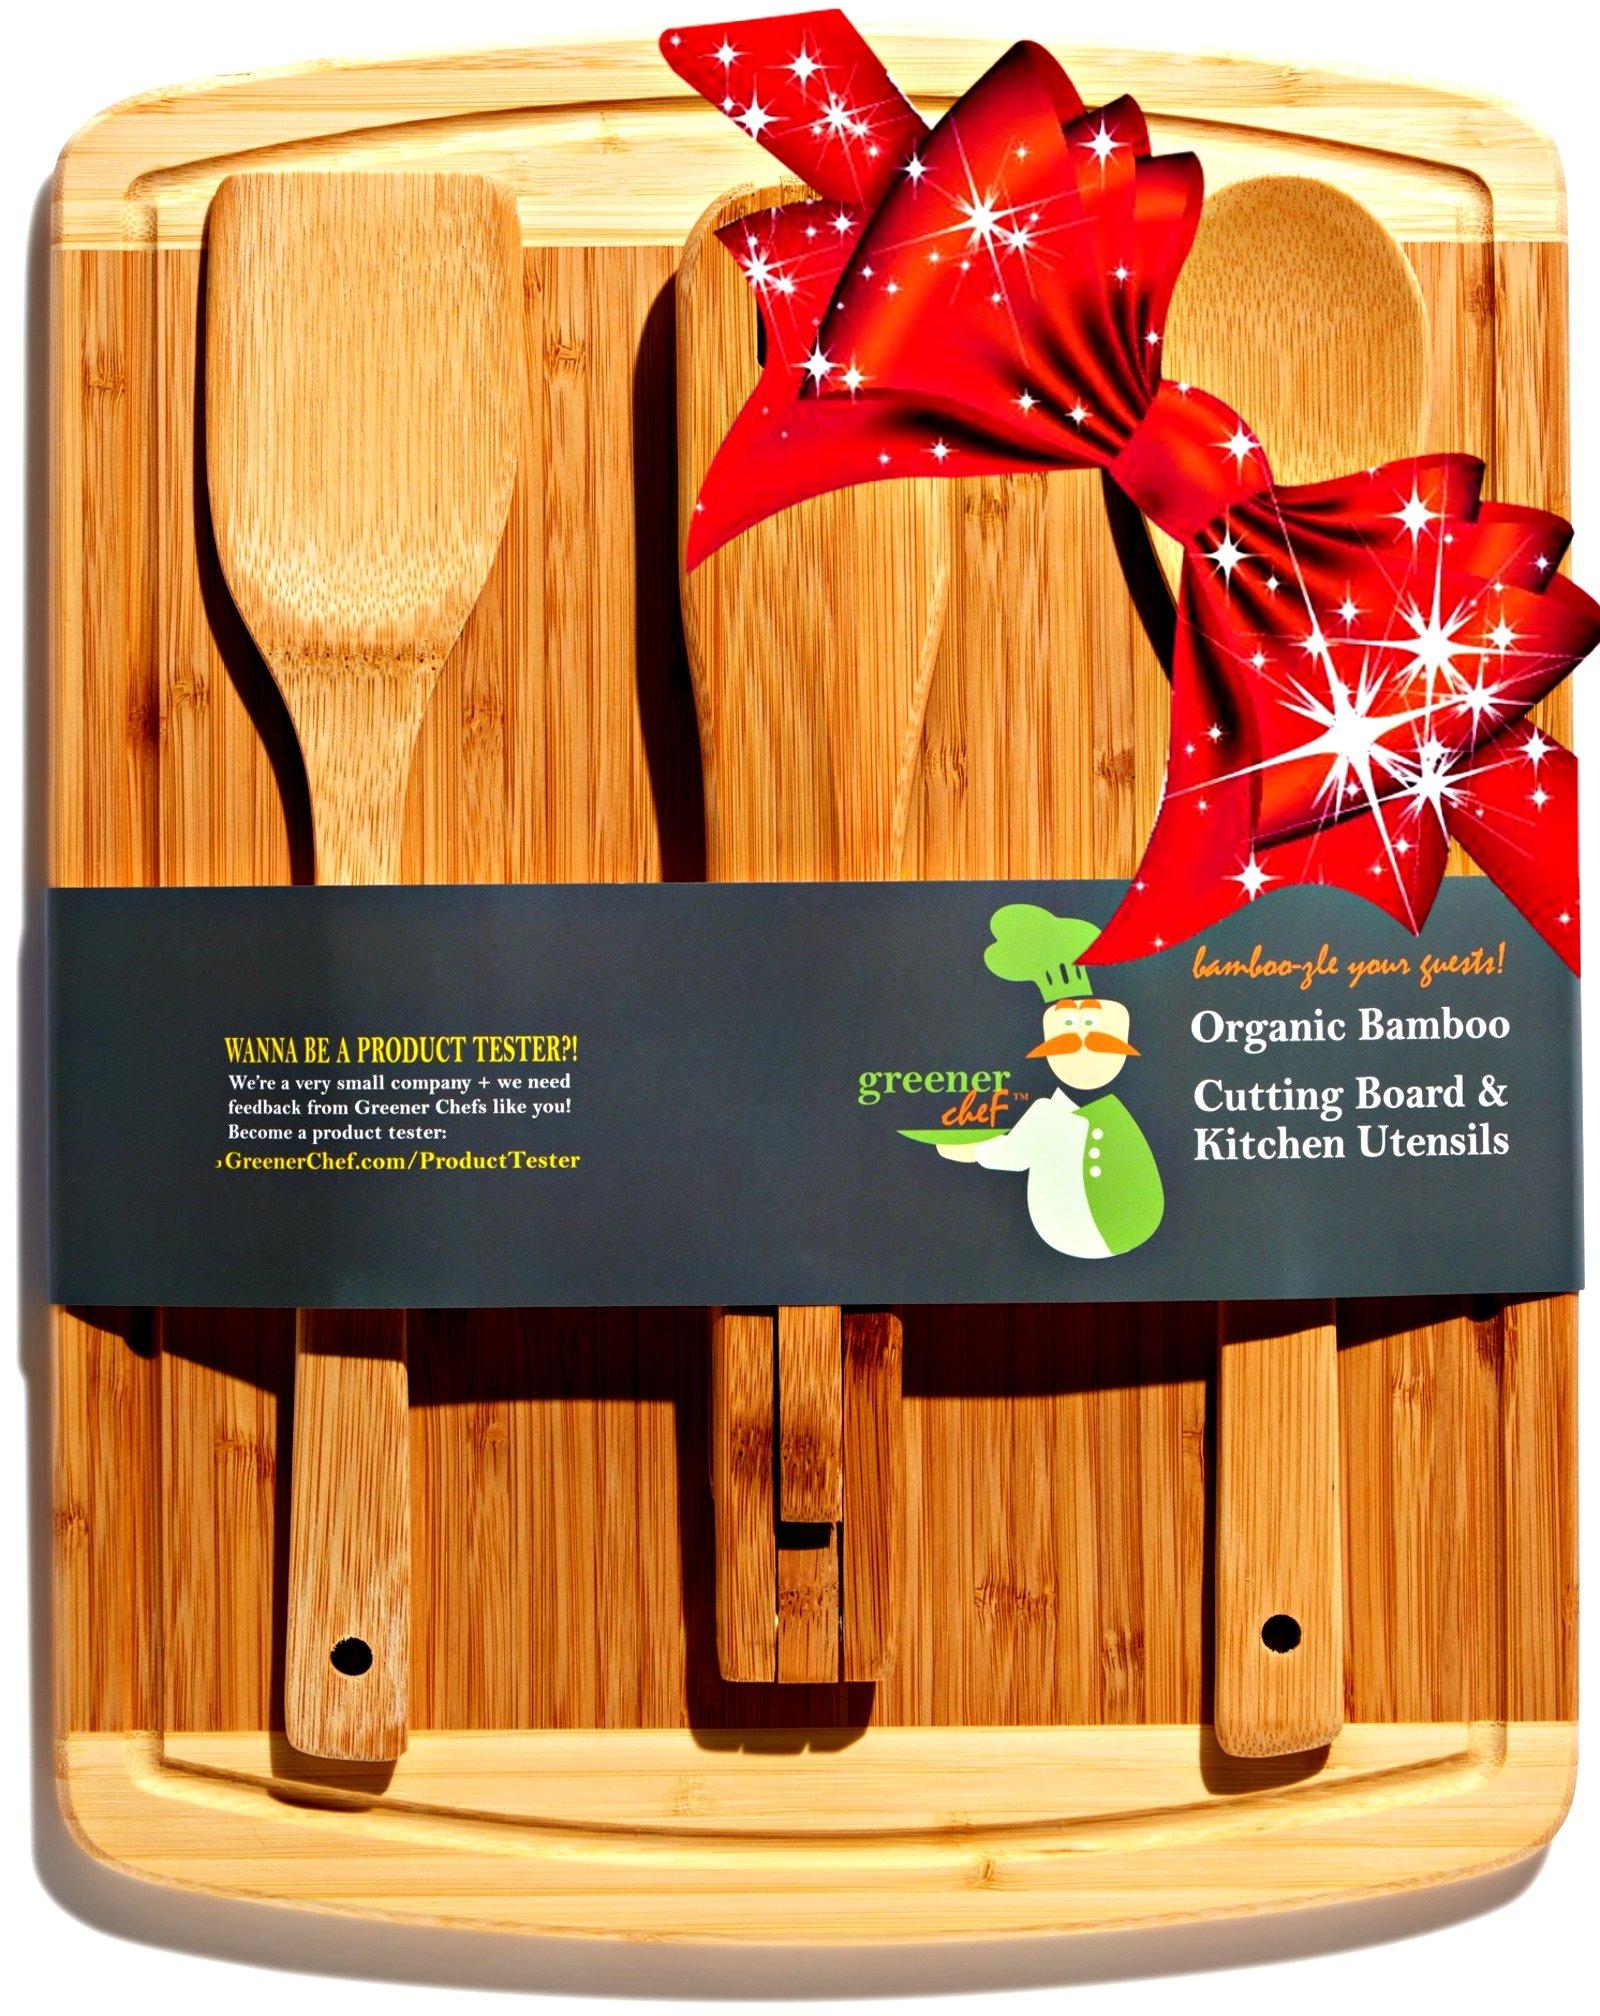 Bamboo Cutting Board 14 X 11 Bonus 3 Pc Utensils Housewarming Wedding Mother